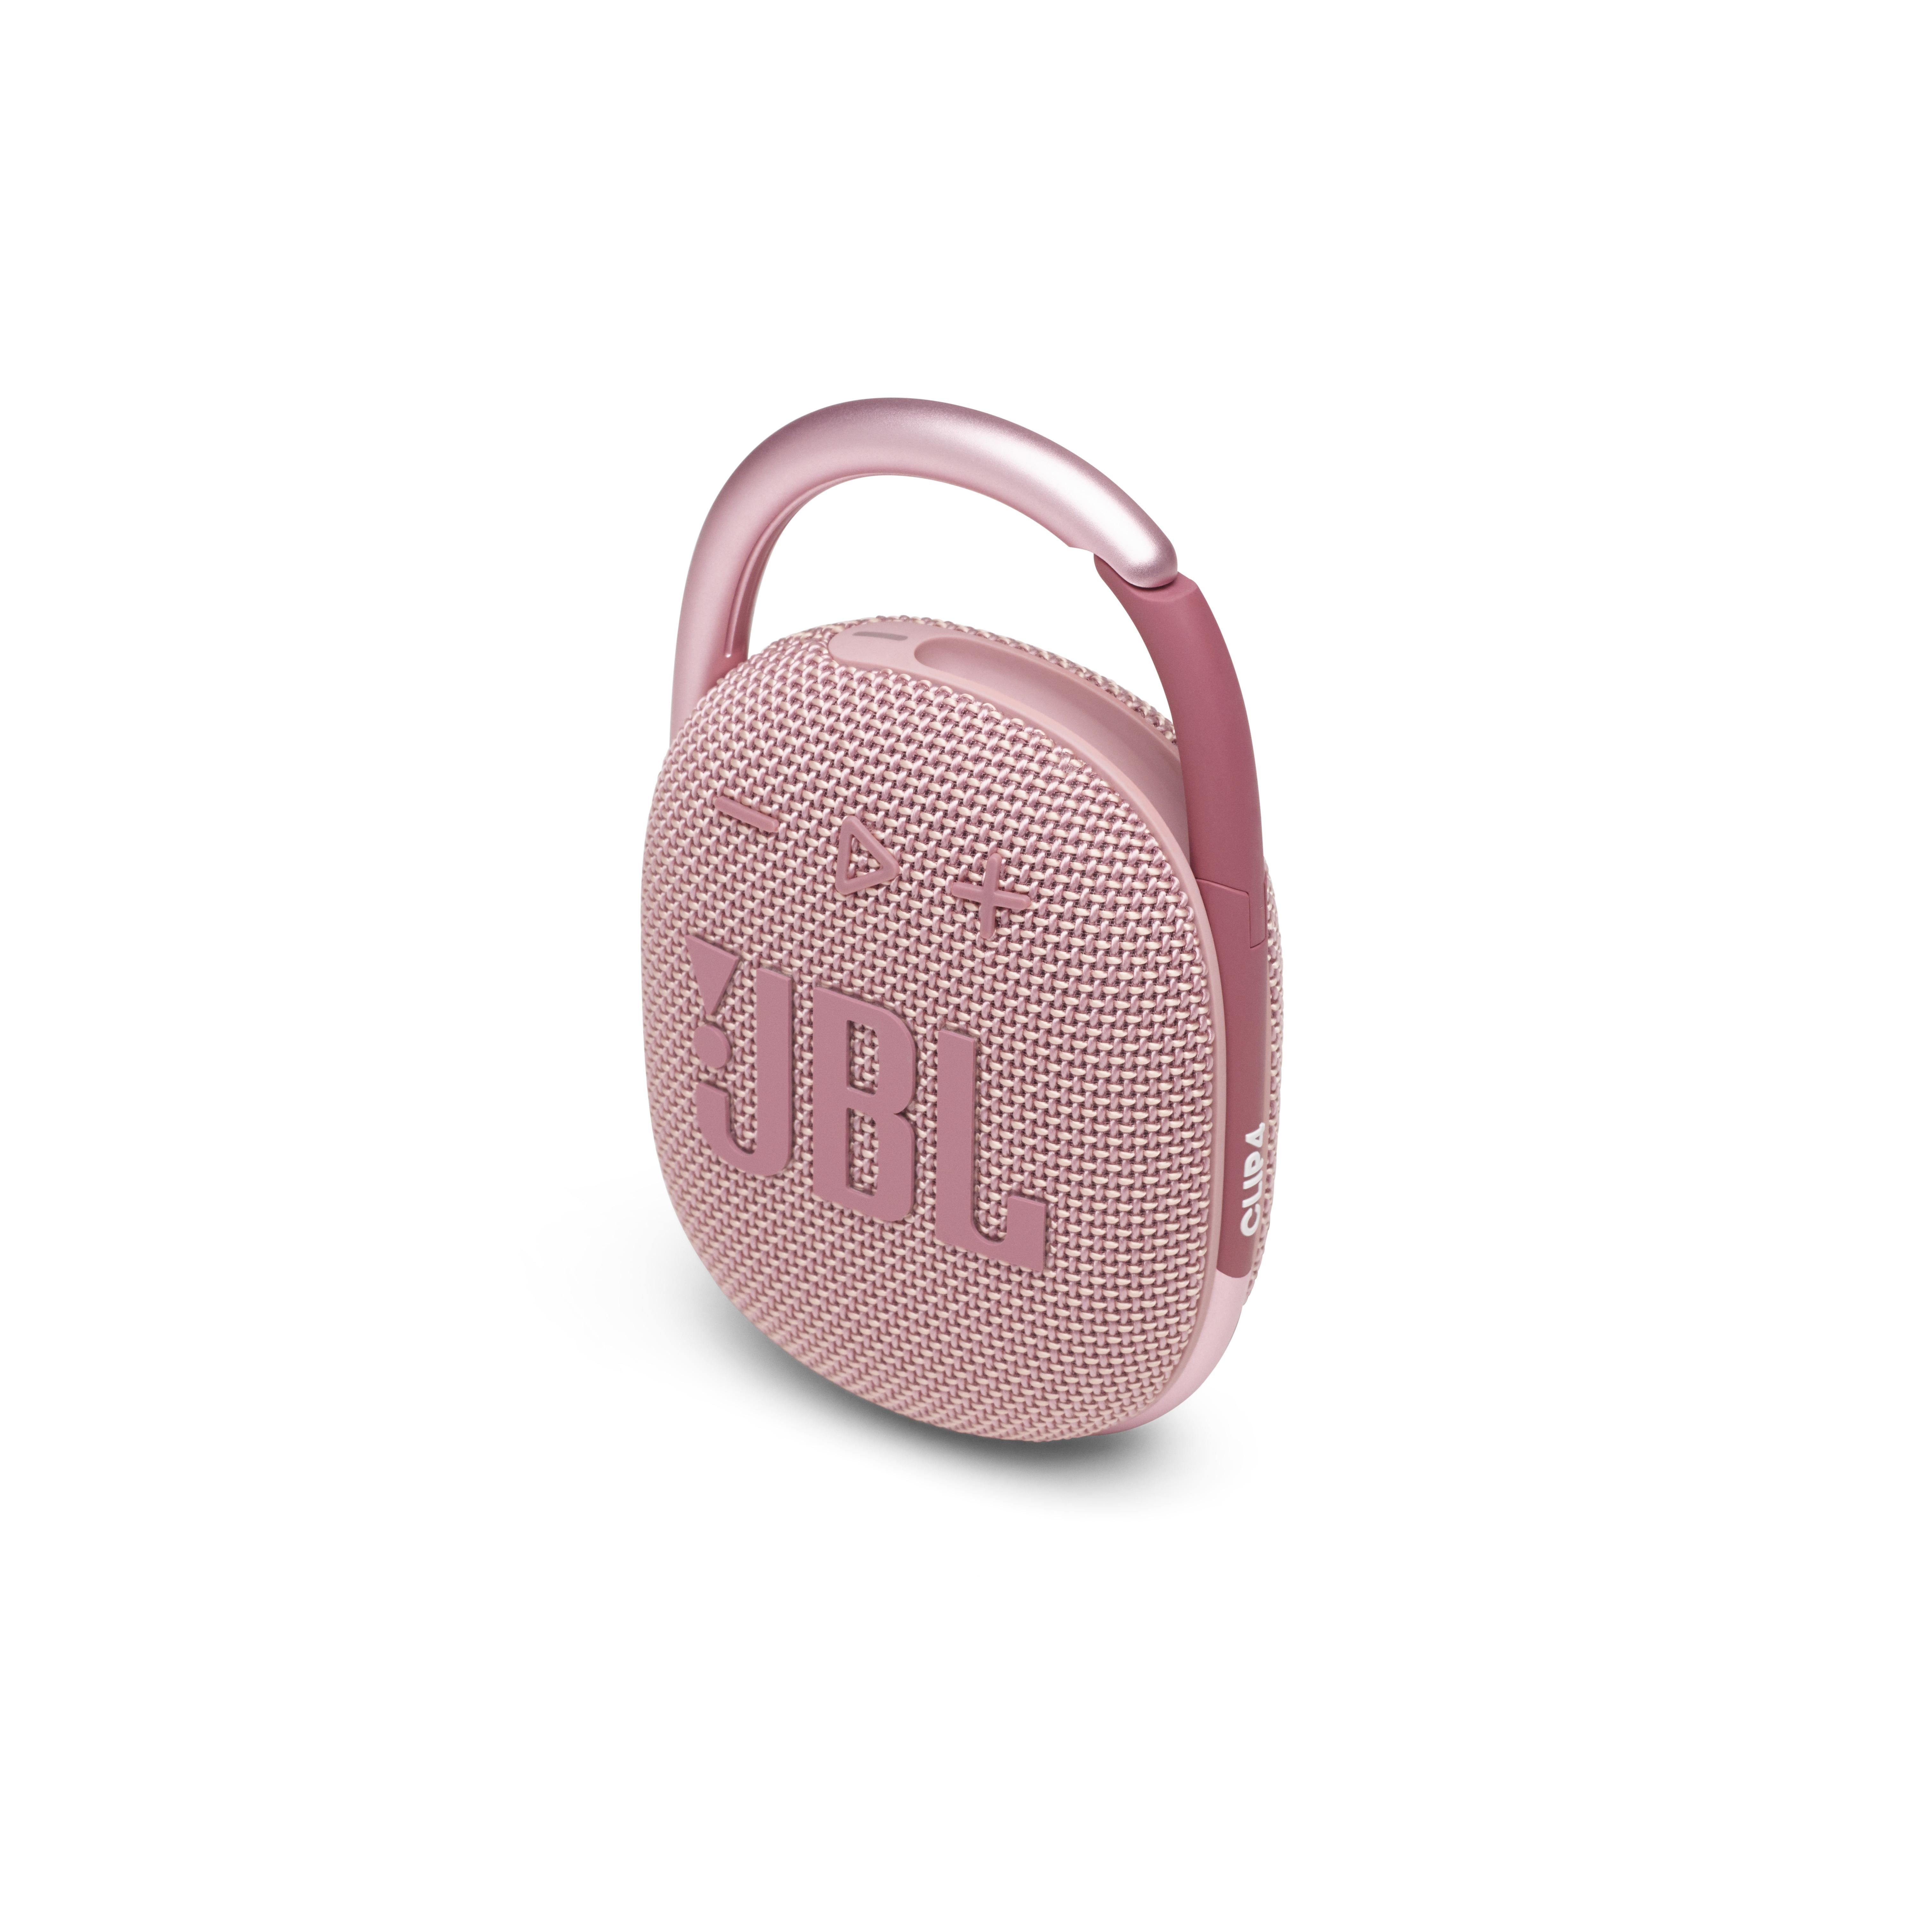 398054 jbl clip4 3 4 left standard pink 0457 x2 e934ce original 1627572634